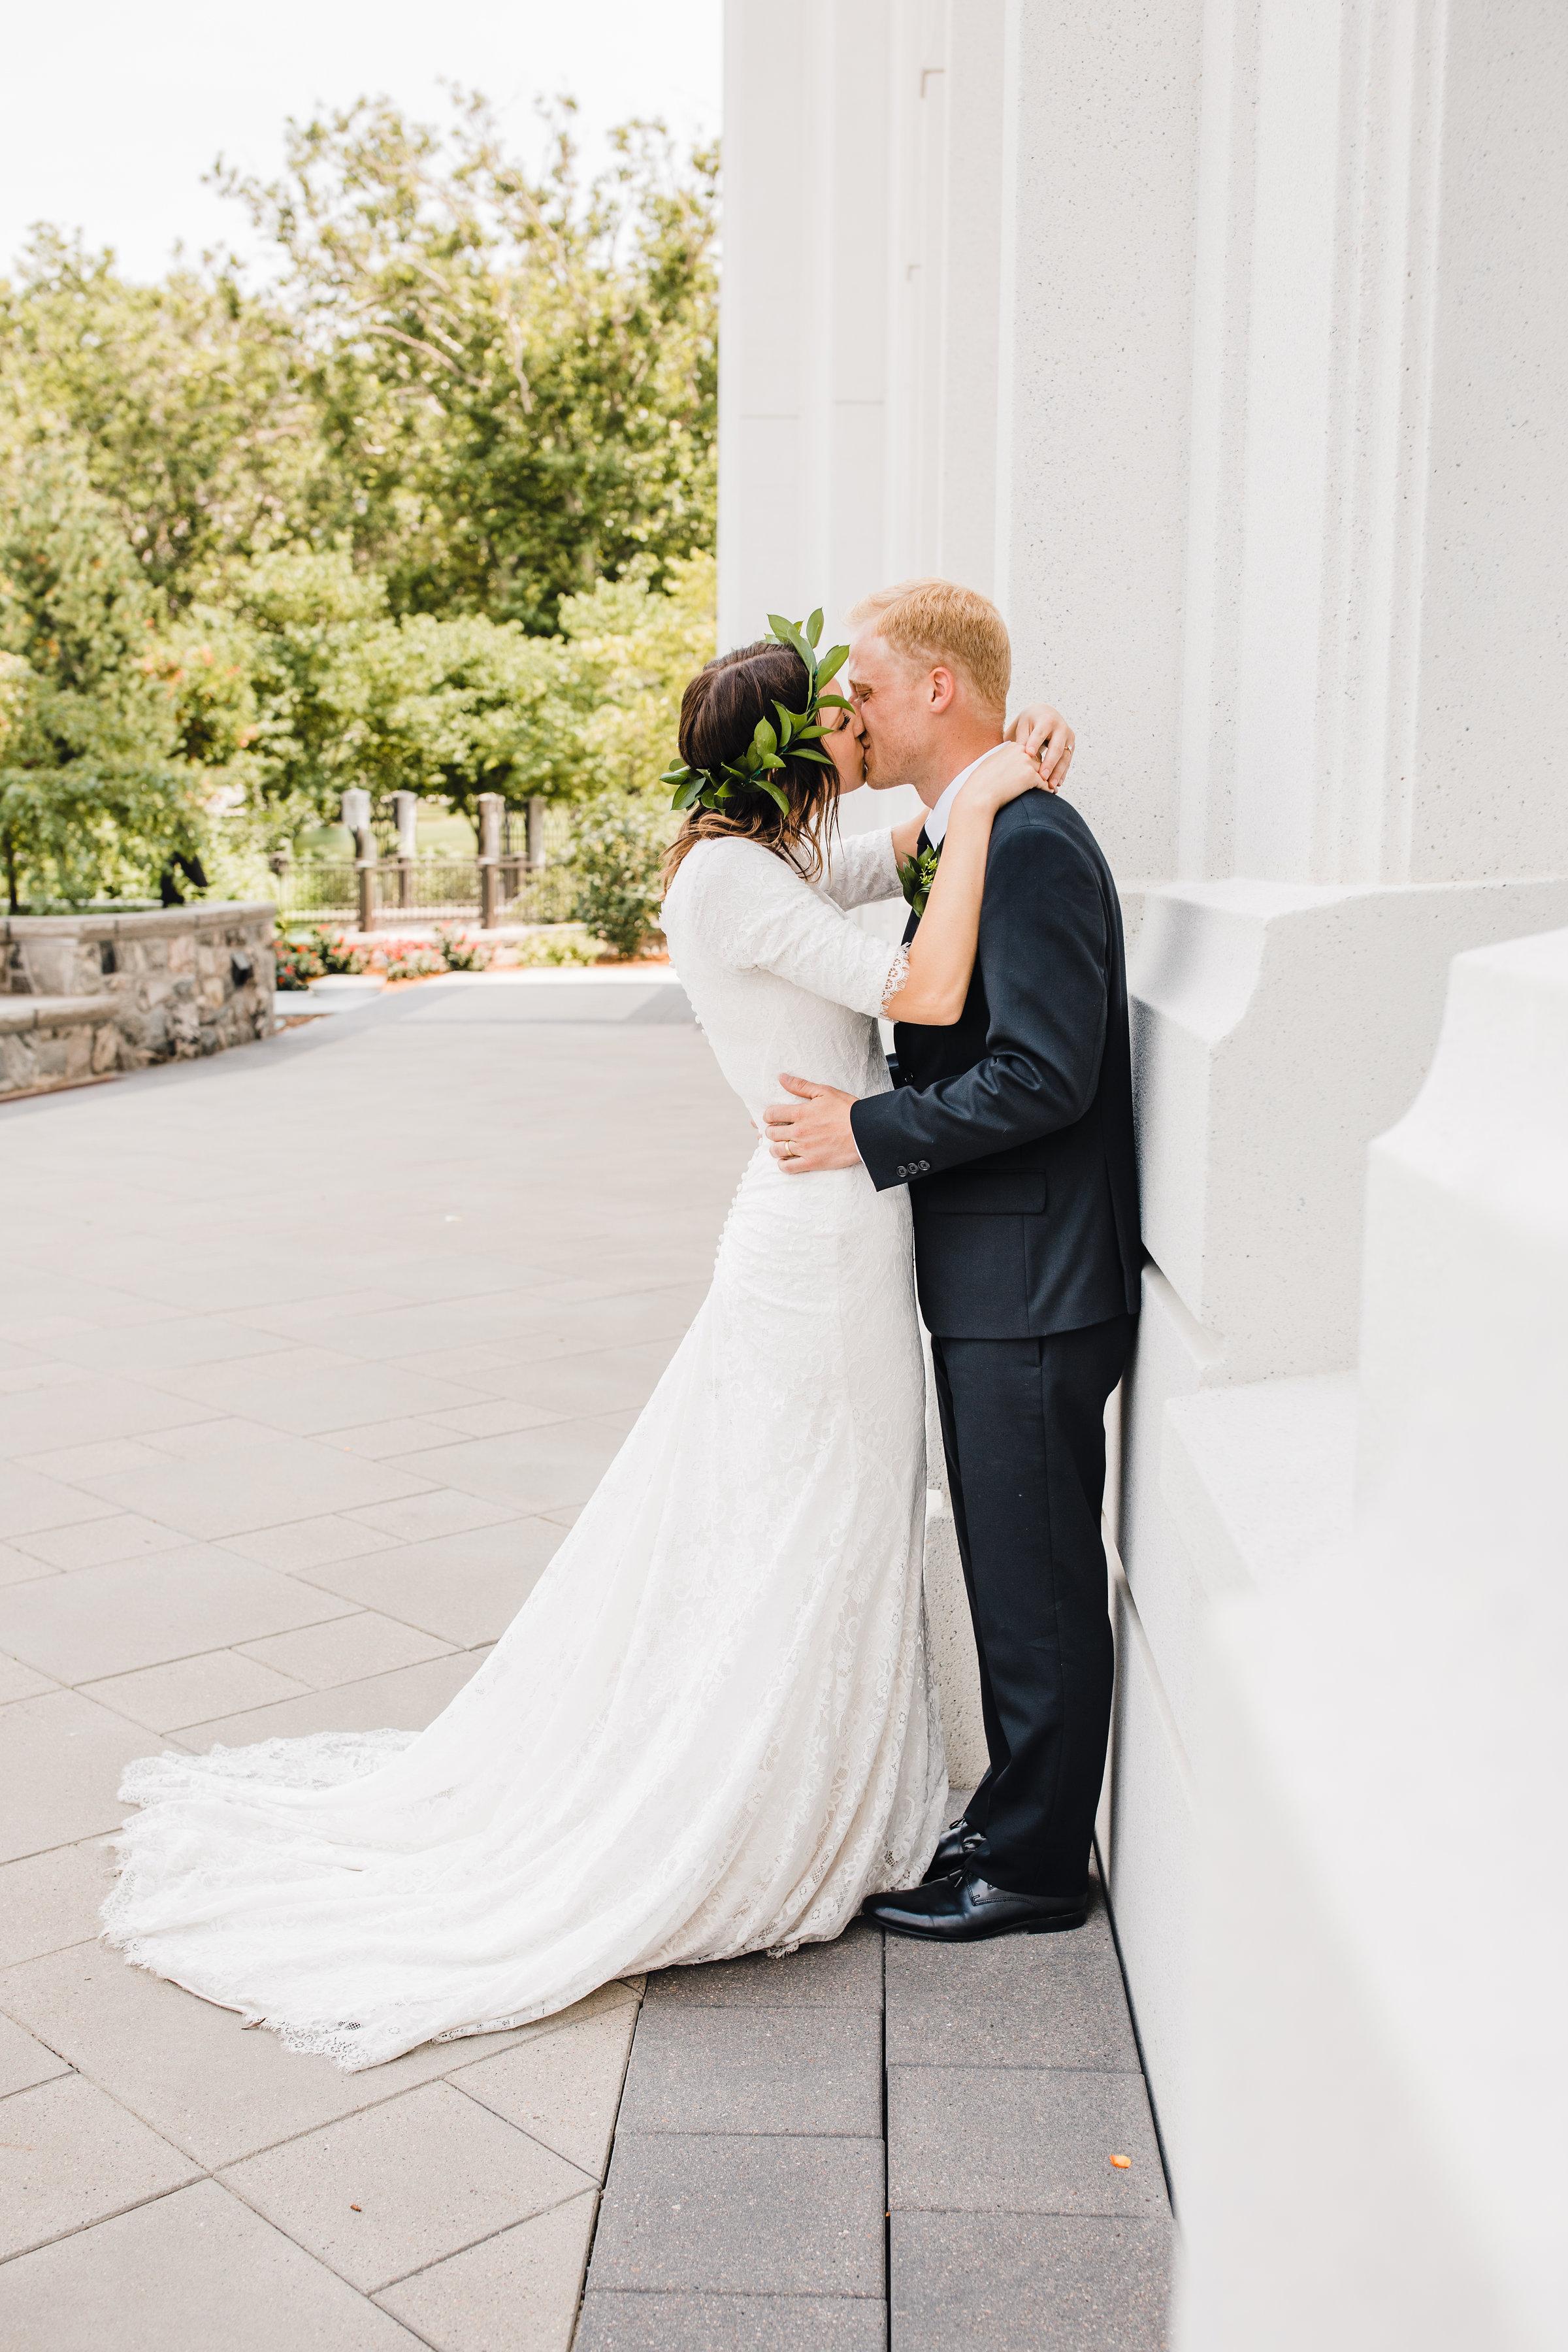 brigham city weddding photographer best kissing romantic lds temple floral crown